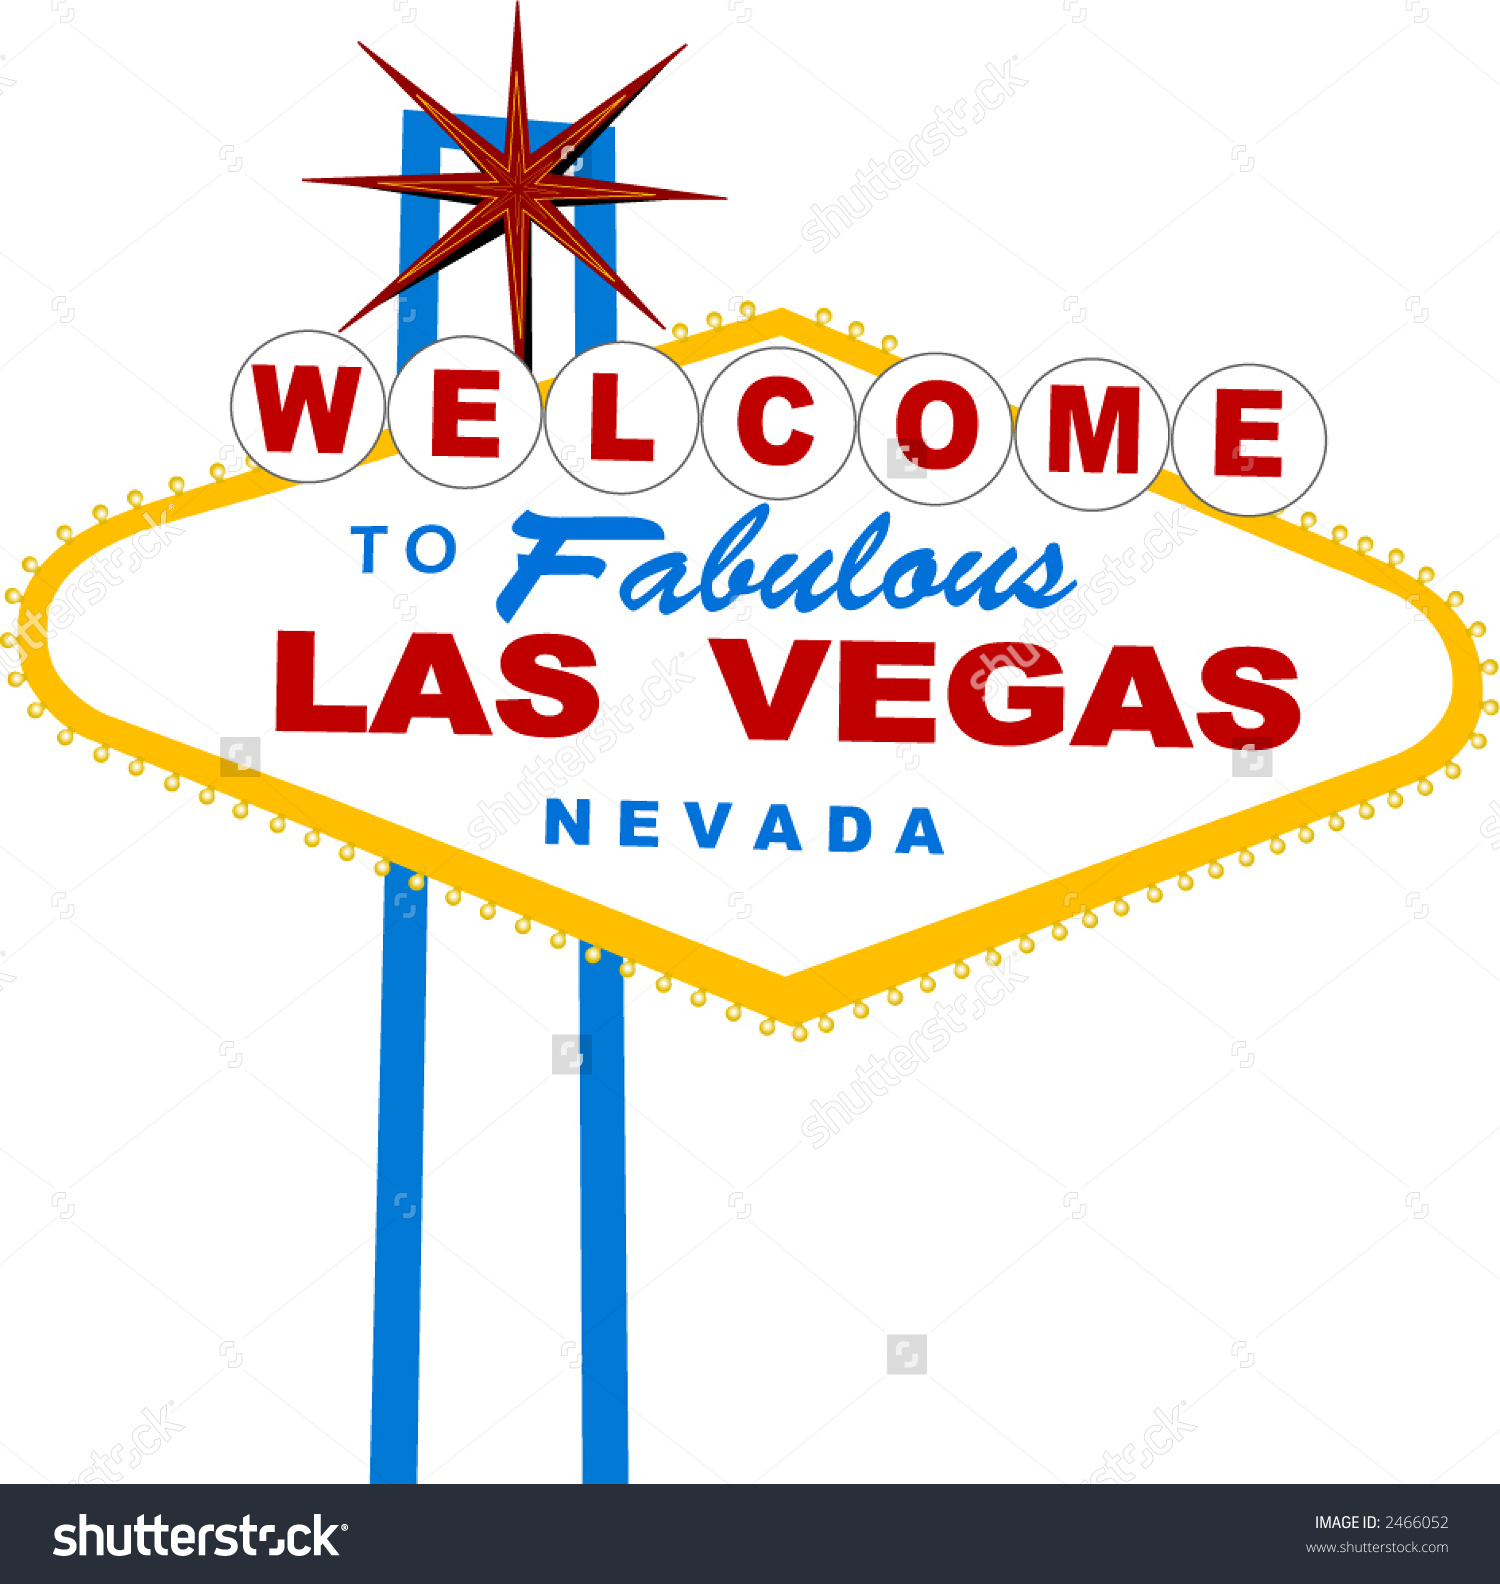 Welcome Fabulous Las Vegas Vector Series Stock Vector 2466052.